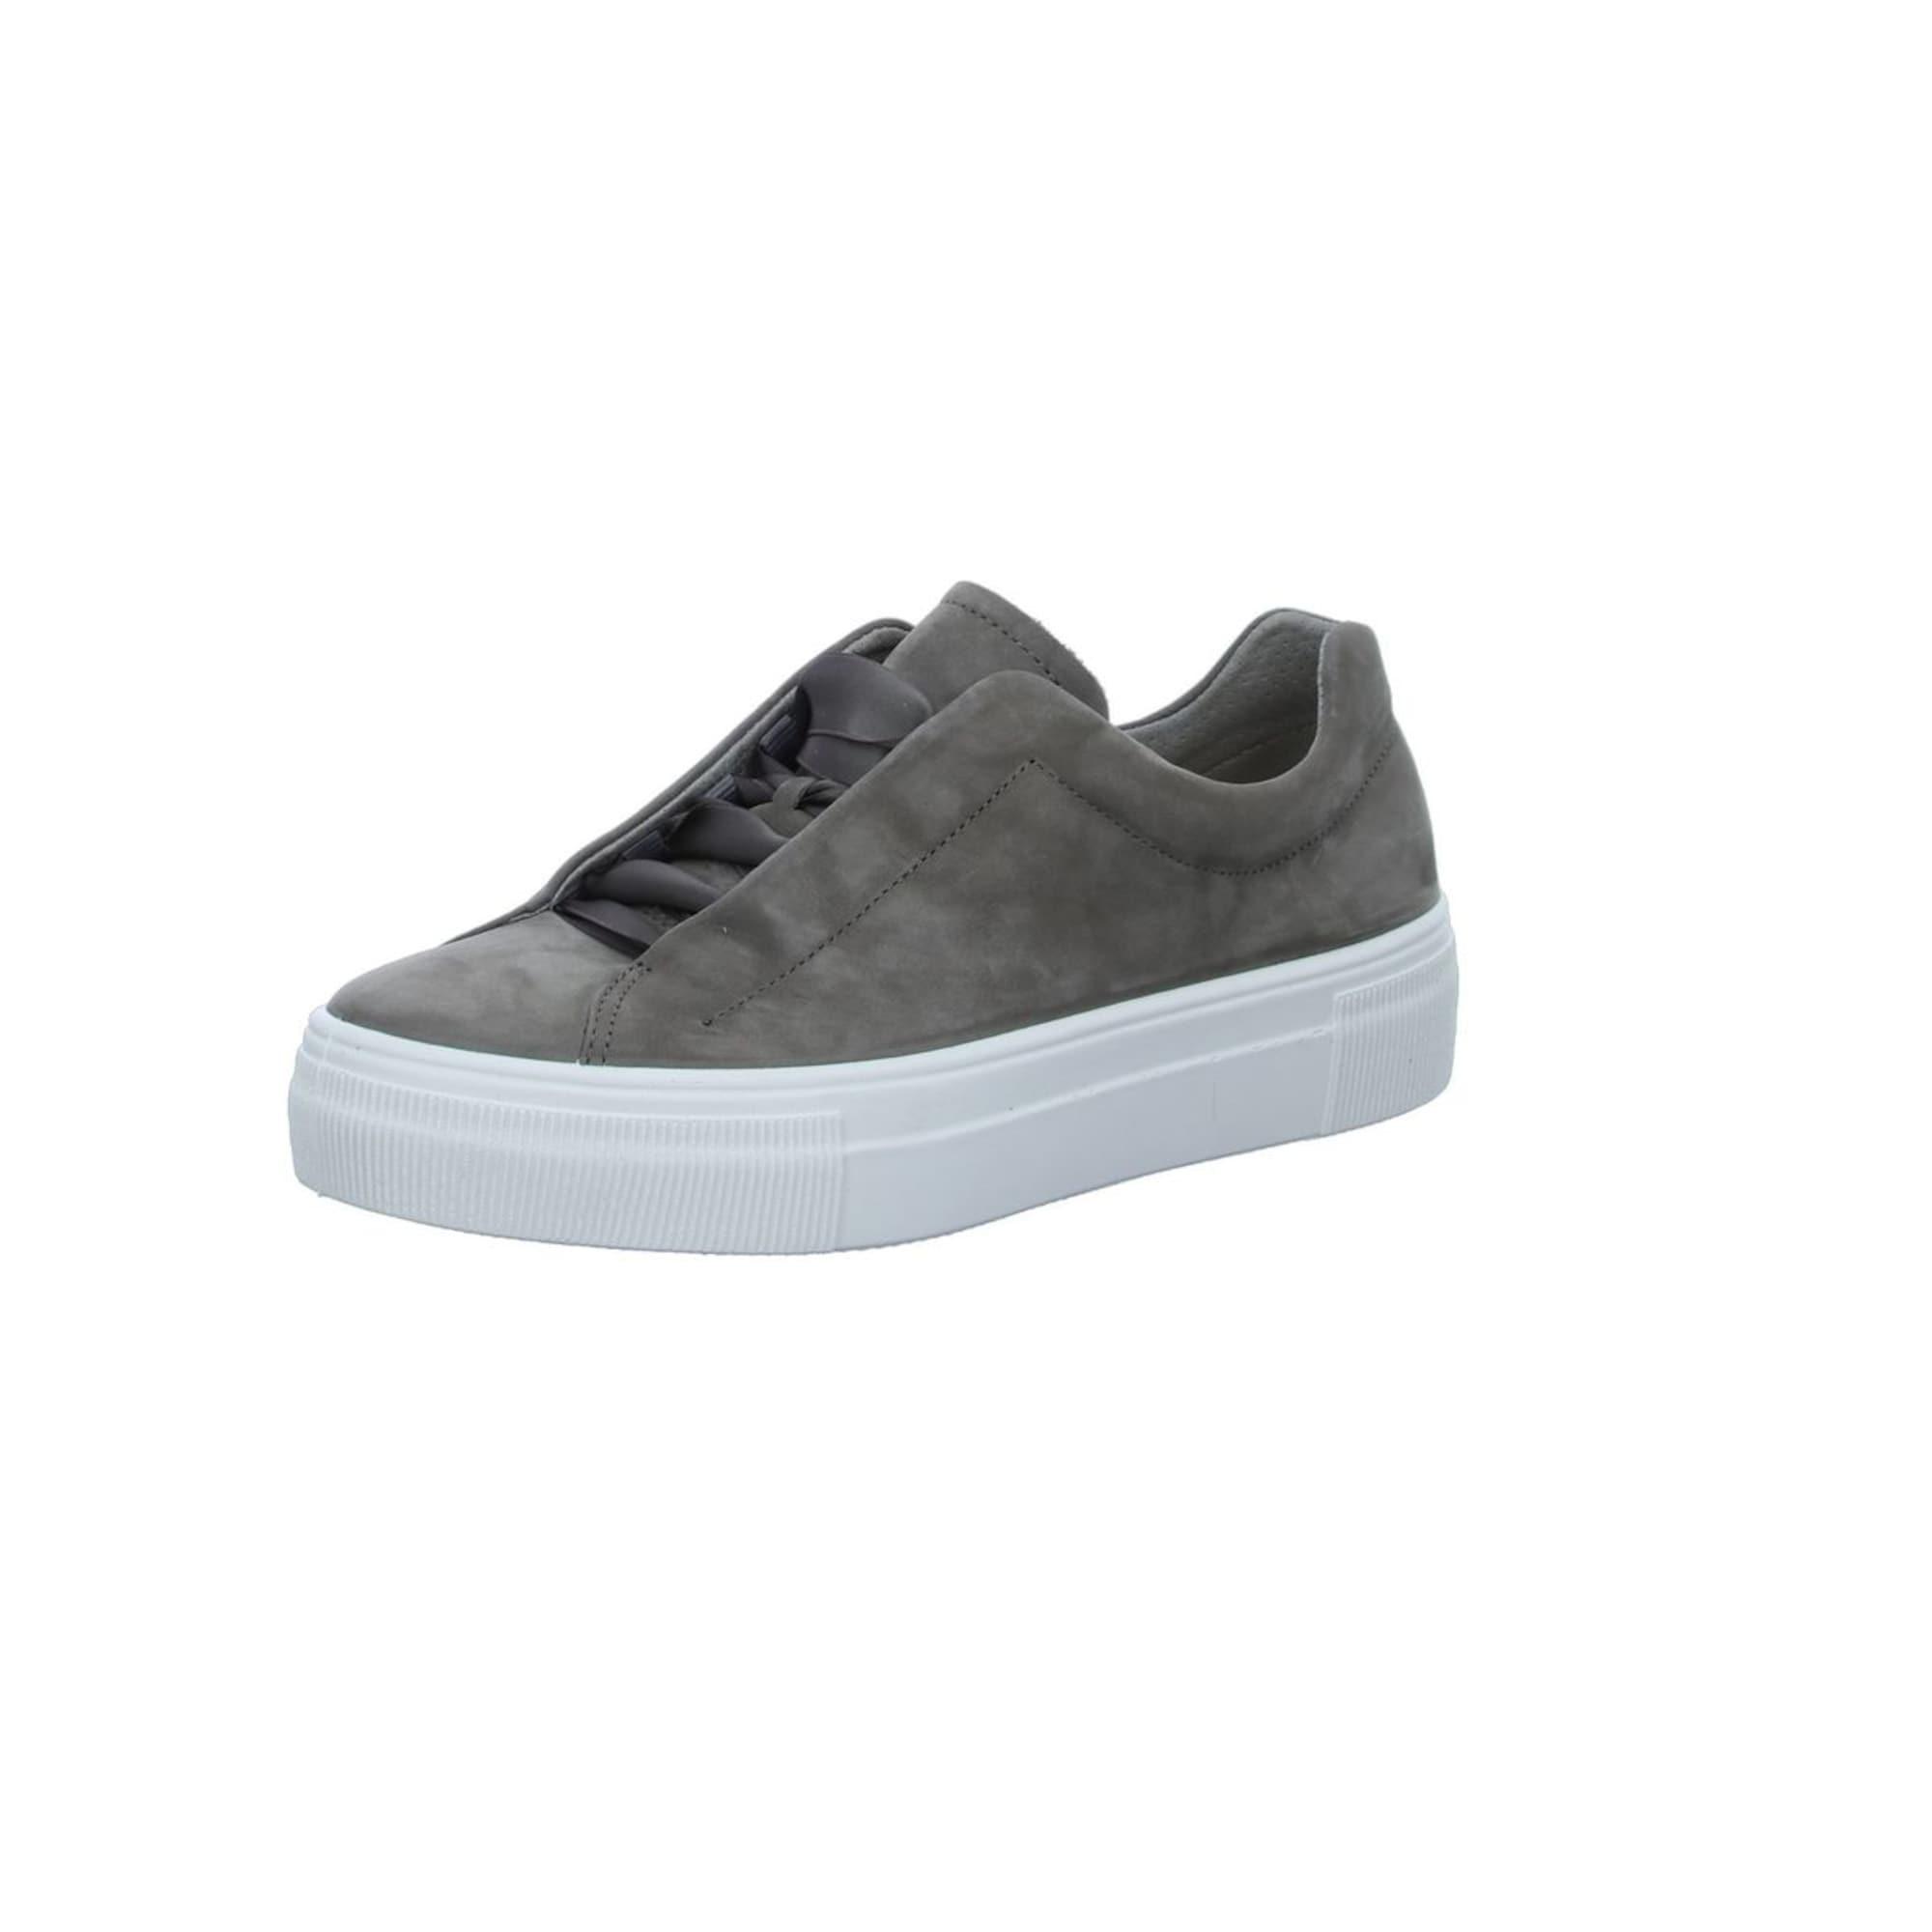 Schnürschuhe | Schuhe > Schnürschuhe | Legero